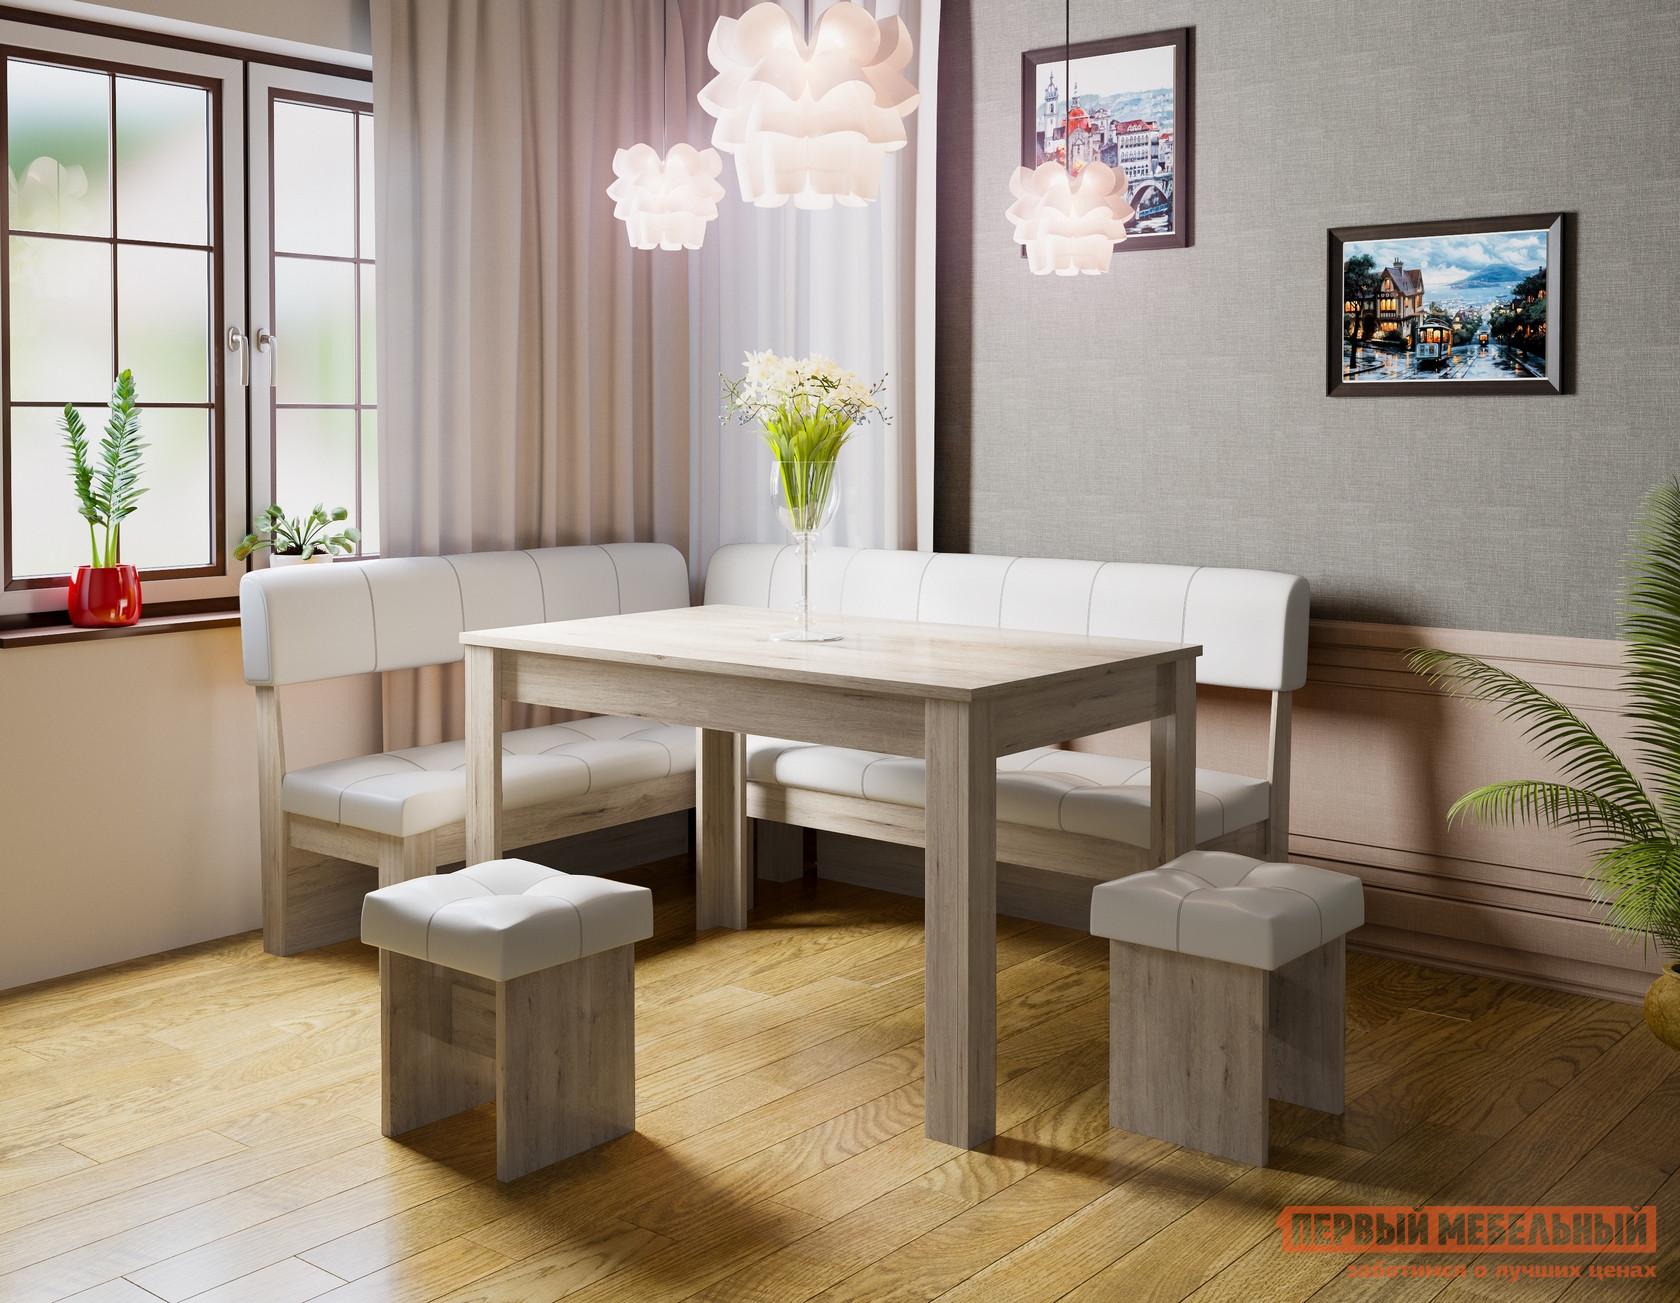 Кухонный уголок  Кухонный уголок Валенсия Дуб Бонифаций, Светлый, экокожа — Кухонный уголок Валенсия Дуб Бонифаций, Светлый, экокожа